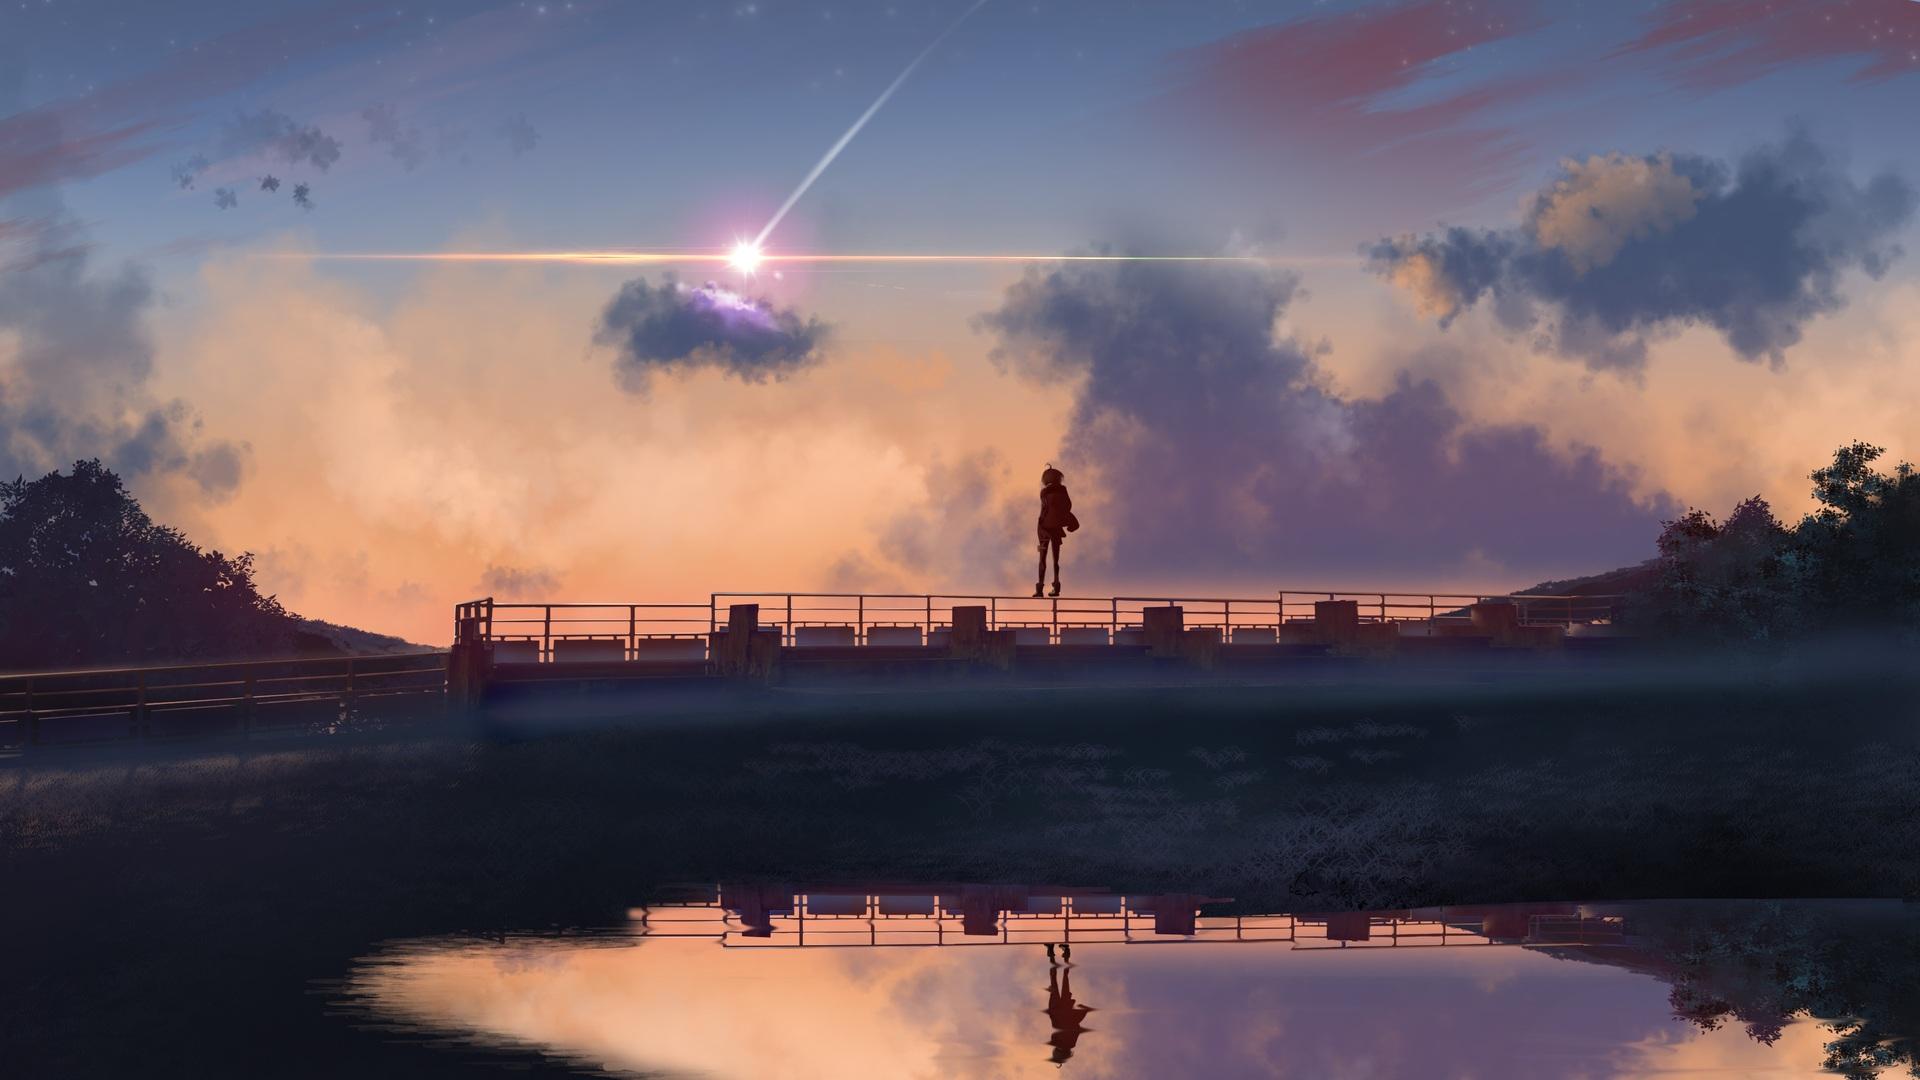 1920x1080 Anime Boy Standing On Bridge 4k Laptop Full Hd